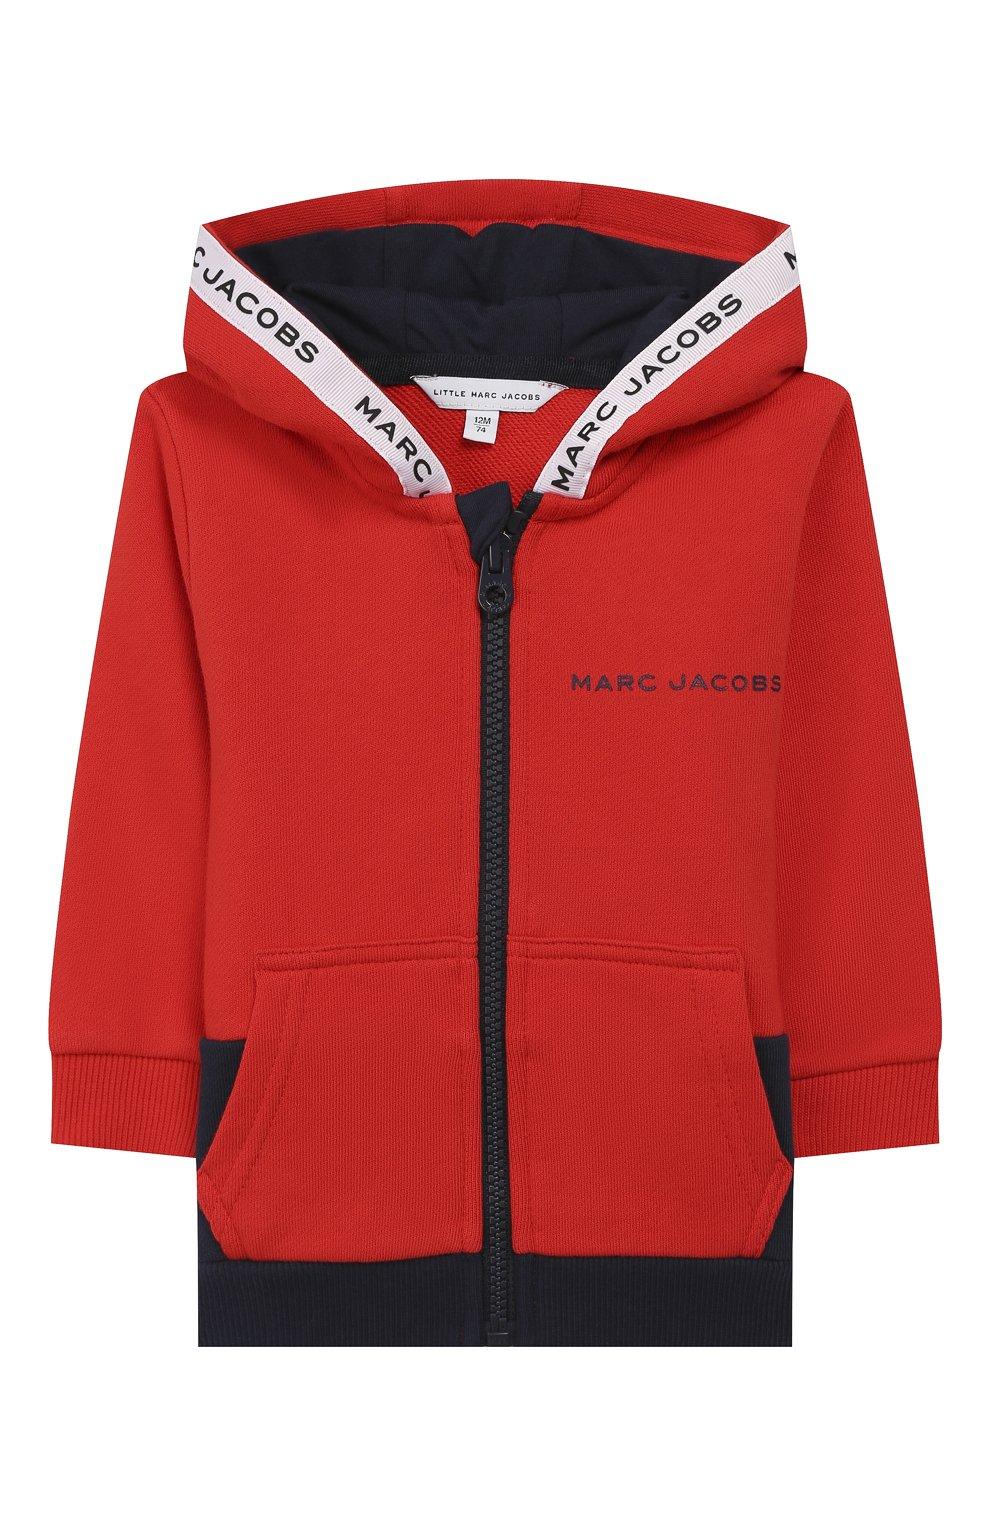 Детский комплект из кардигана и брюк MARC JACOBS (THE) красного цвета, арт. W08070   Фото 2